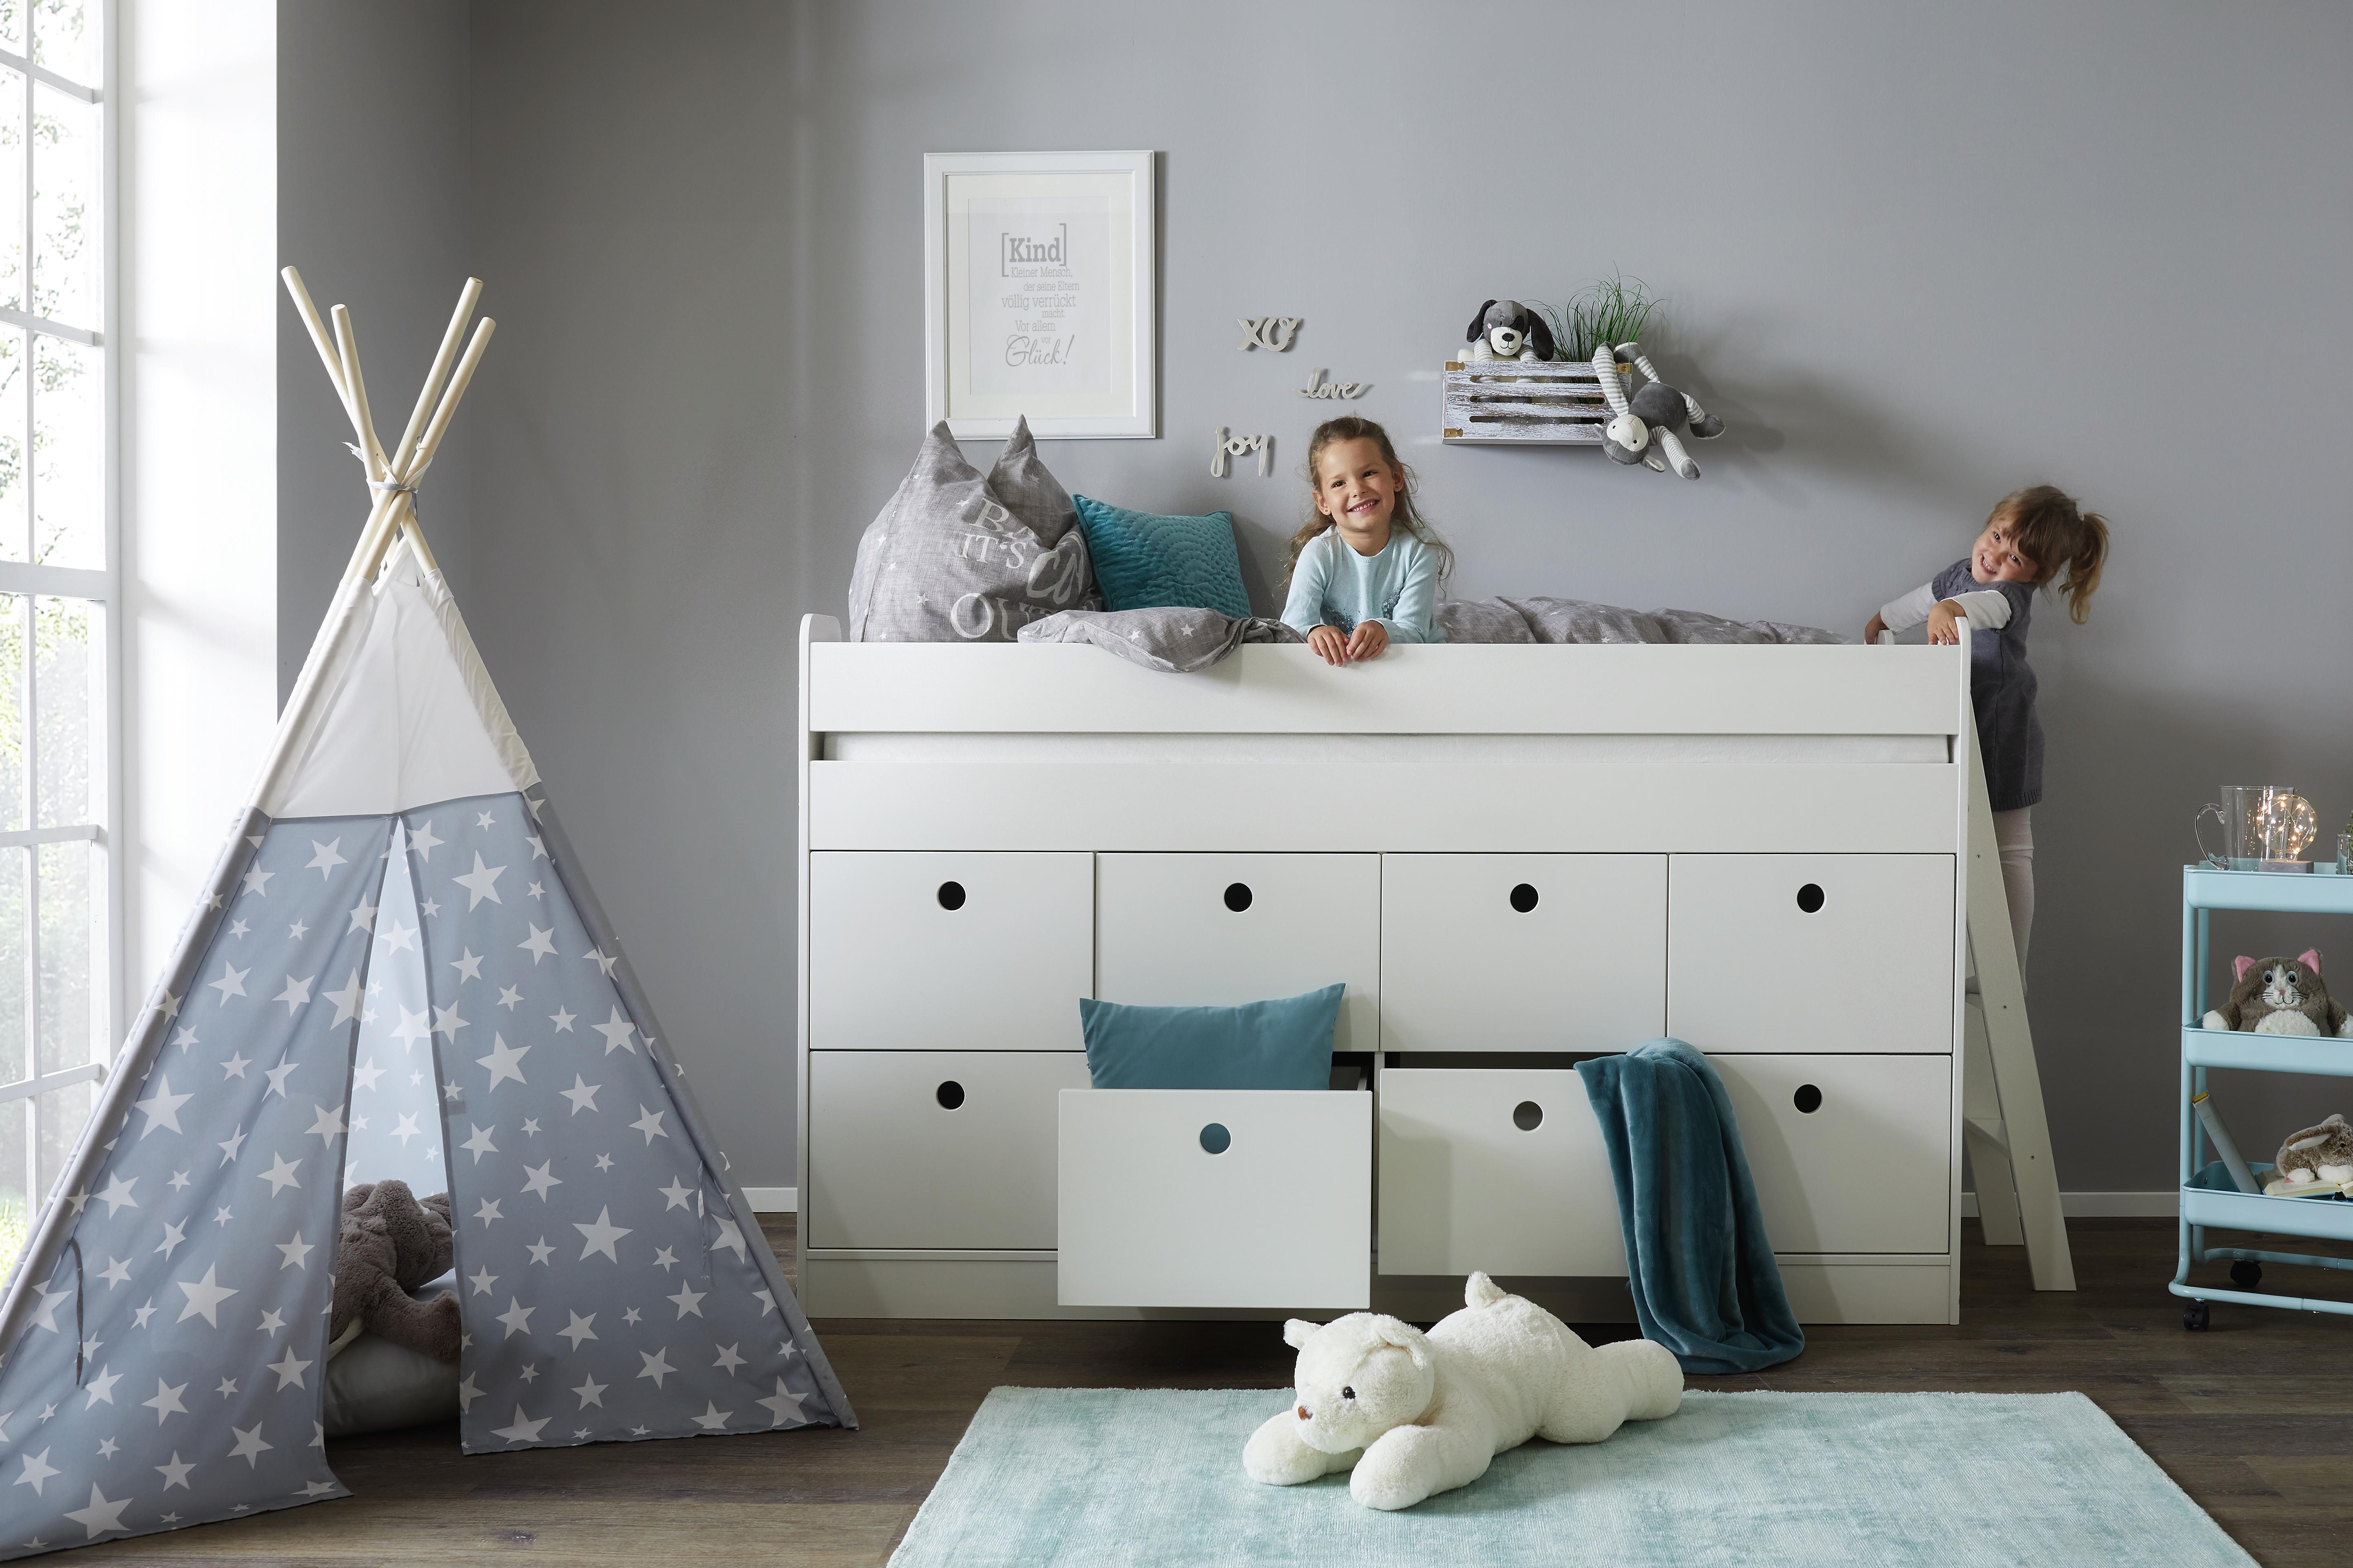 Himmel Für Etagenbett : Kinderbetten entdecken